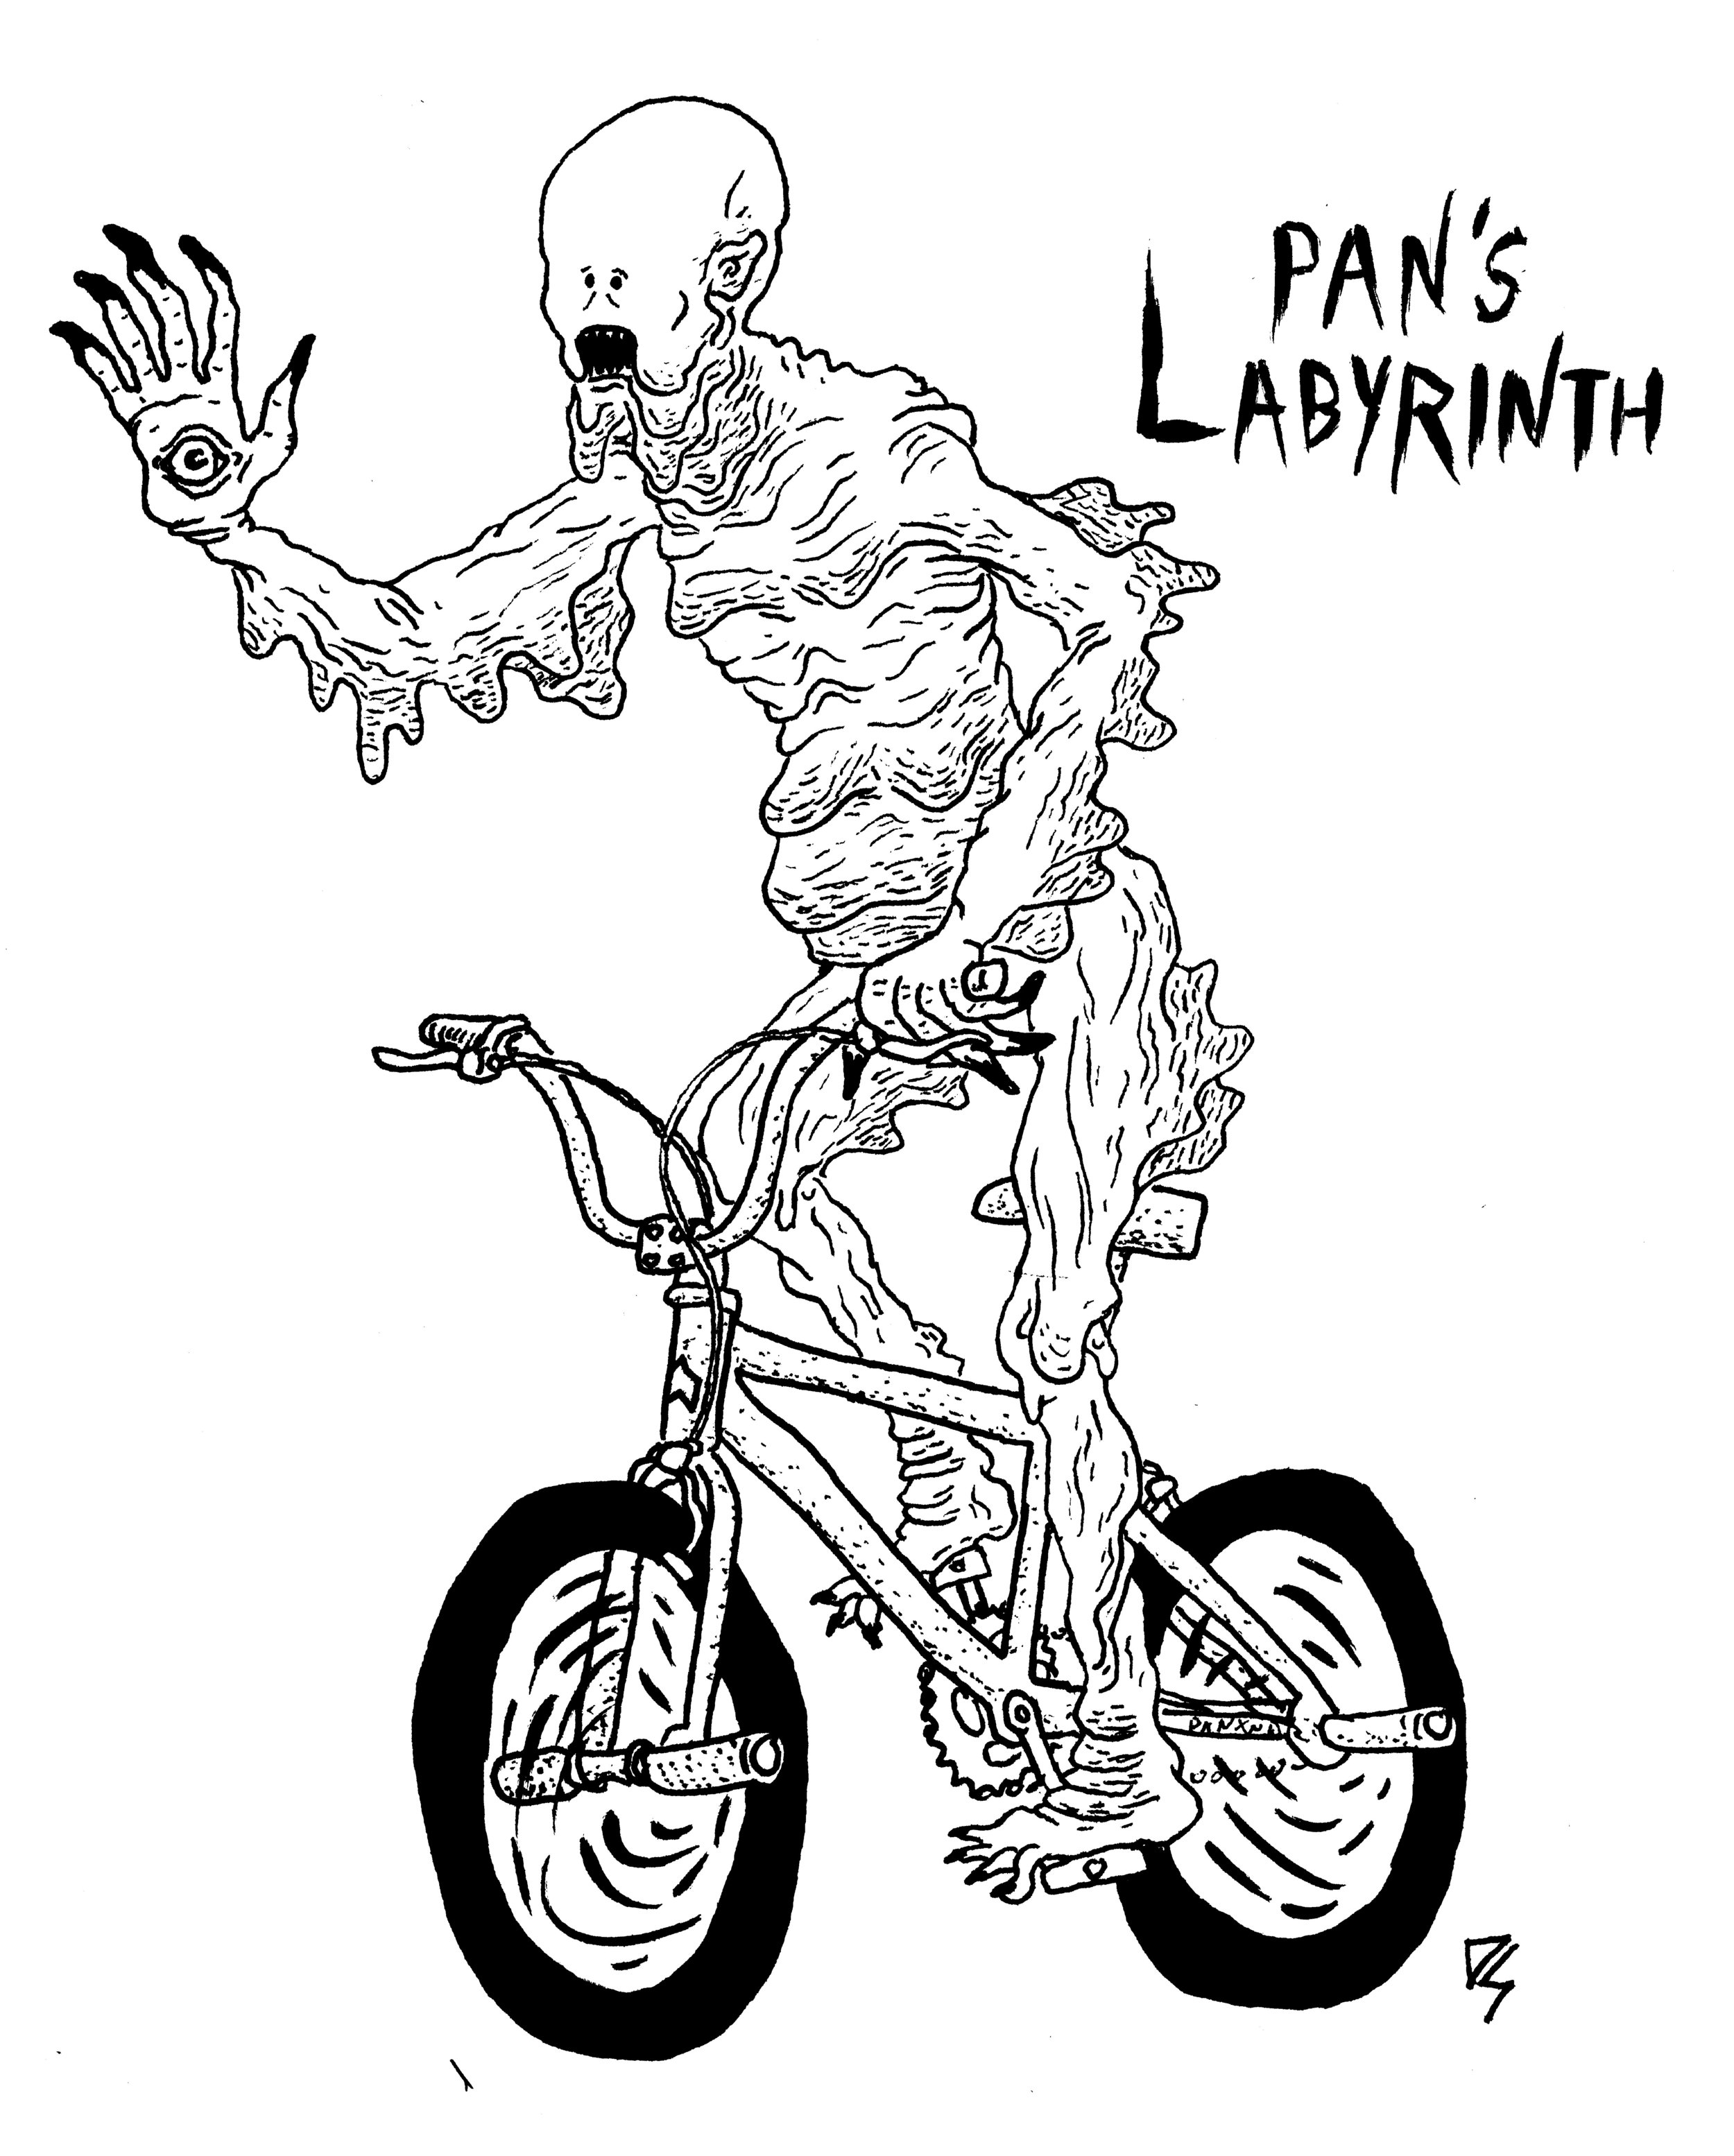 Pans Labyrinth008.jpg